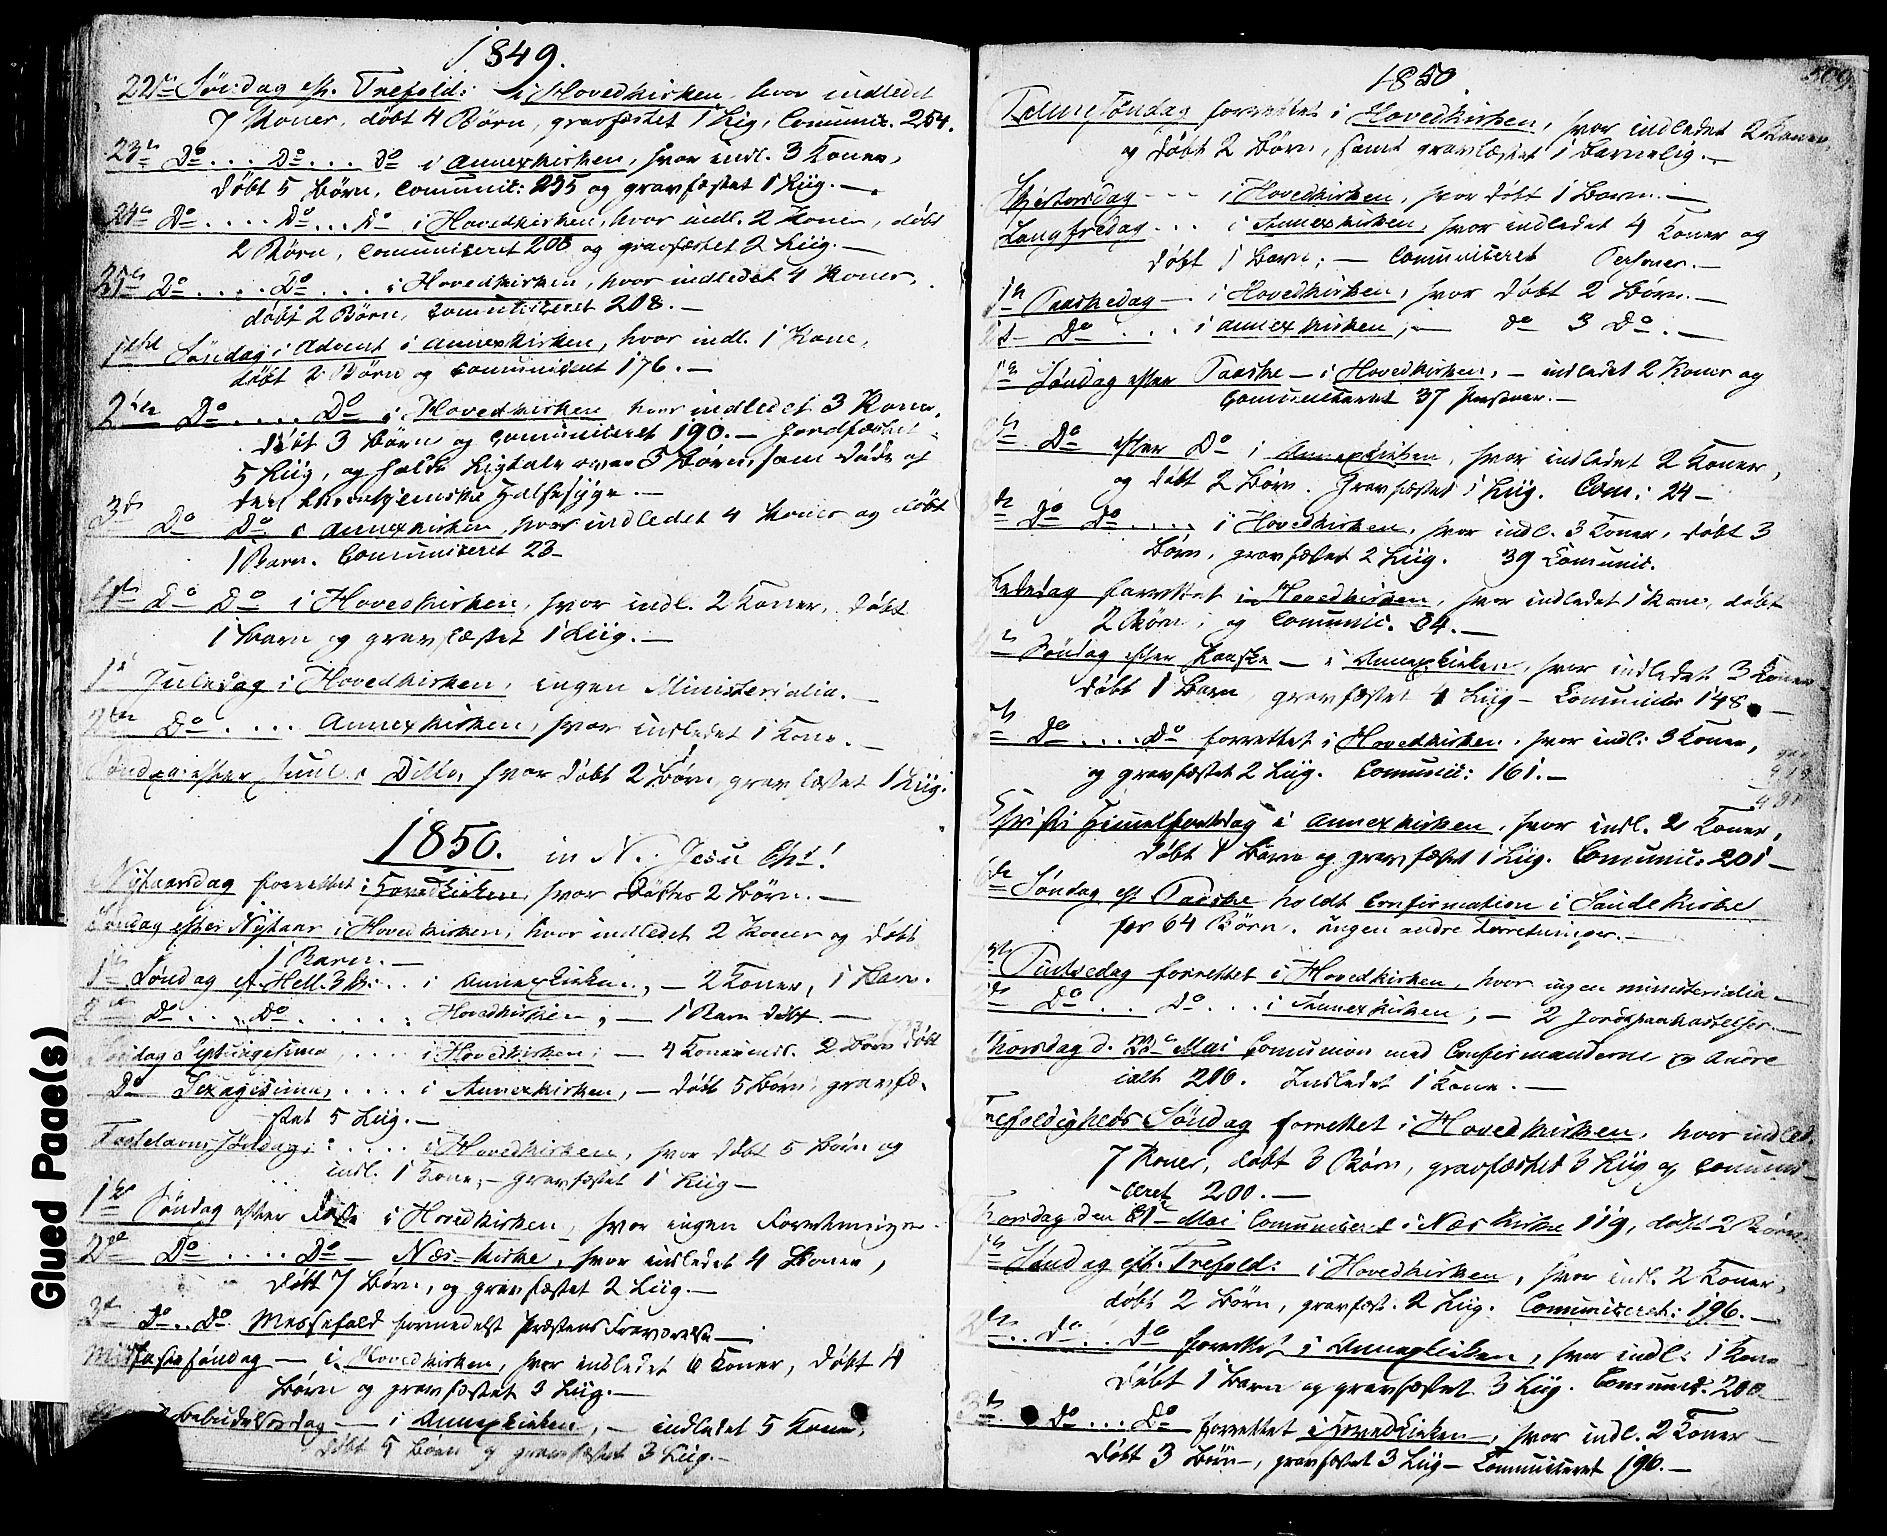 SAKO, Sauherad kirkebøker, F/Fa/L0006: Ministerialbok nr. I 6, 1827-1850, s. 509